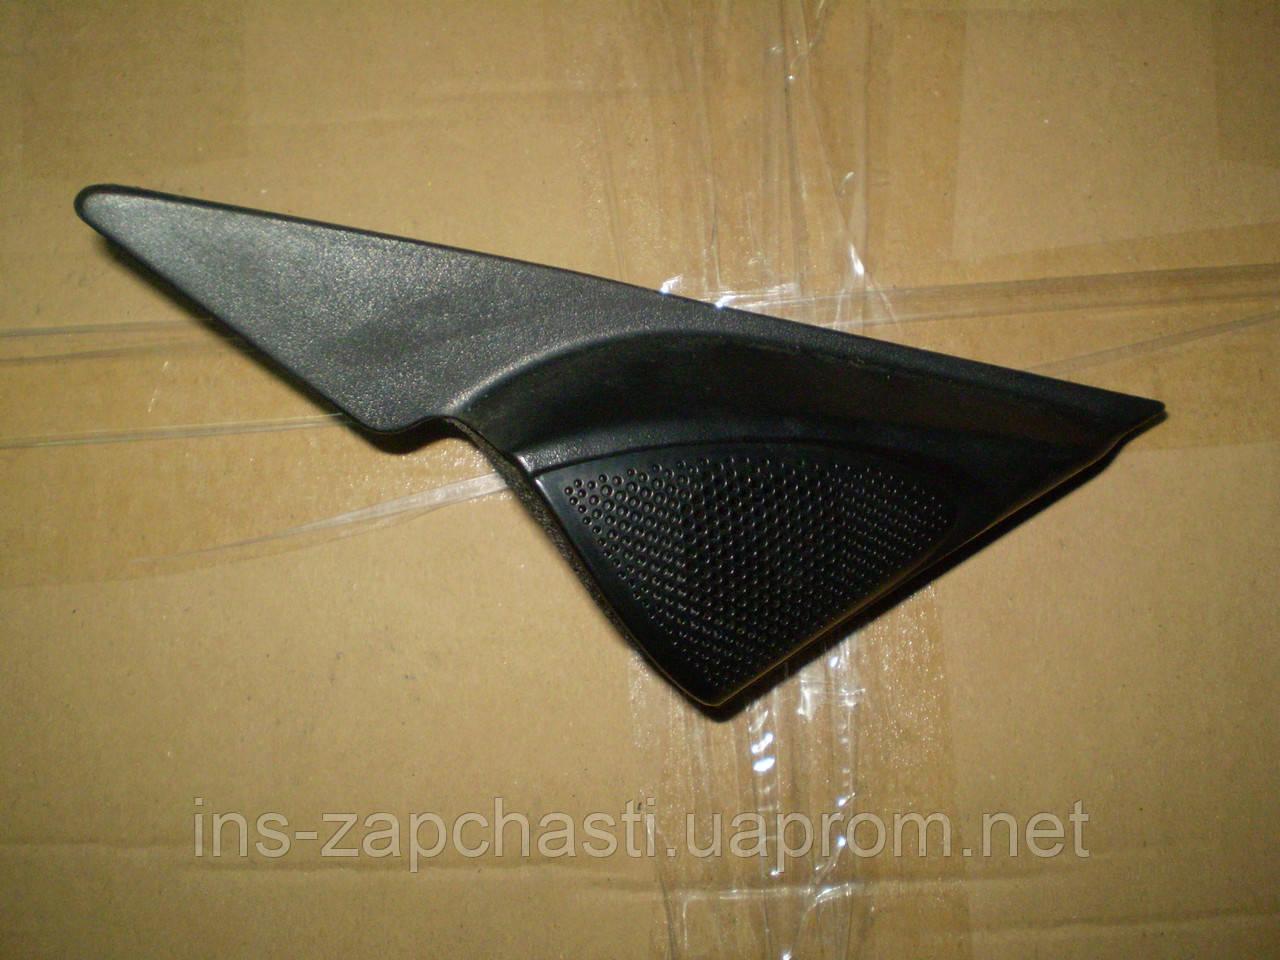 Заглушка зеркала правая внутренняя с пищалкою Mazda 6 2002-2007